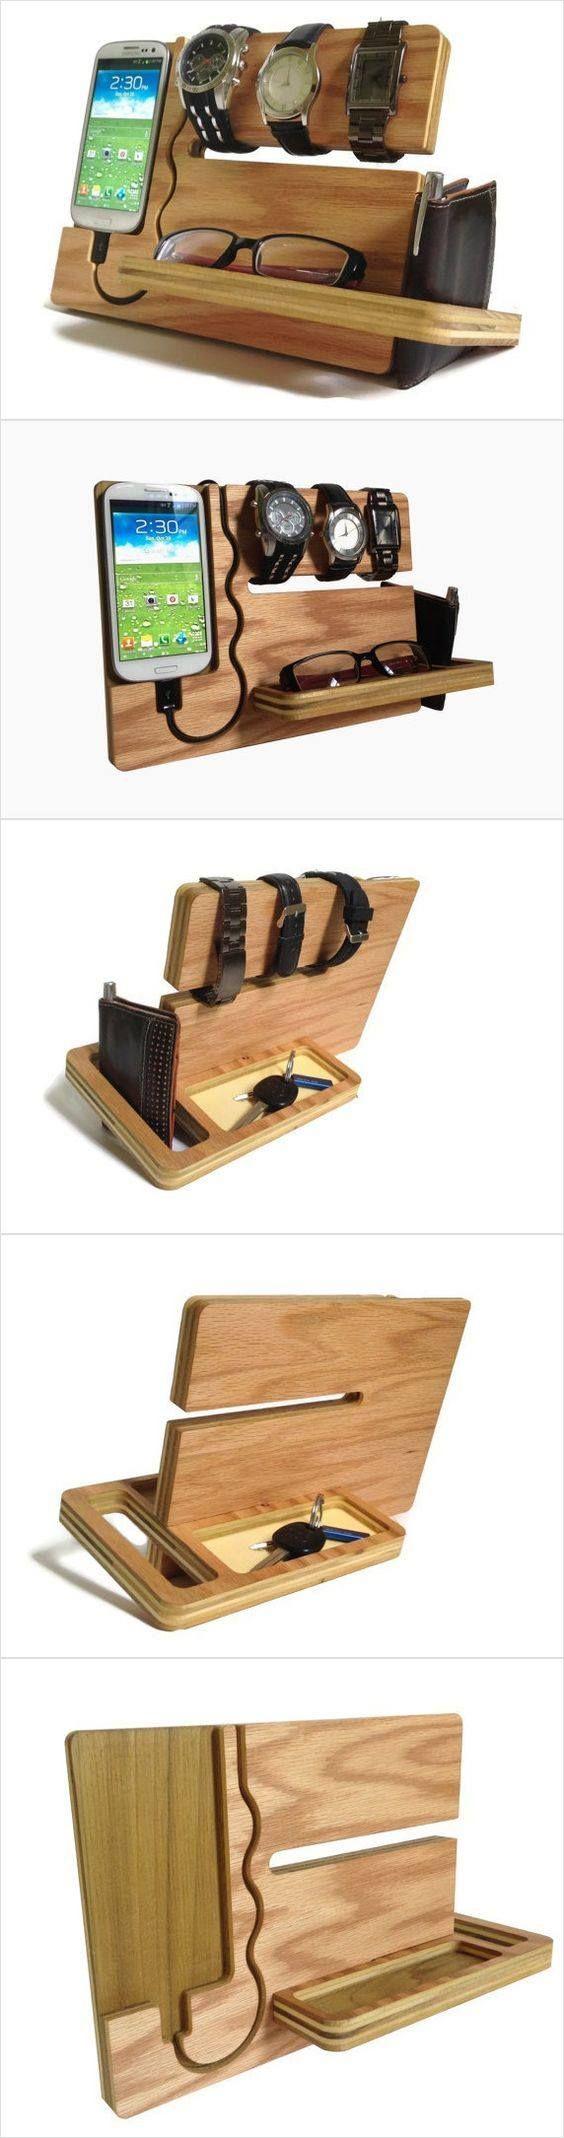 Diseña tu estación de carga con IGRA herrajes: https://www.igraherrajes.com/